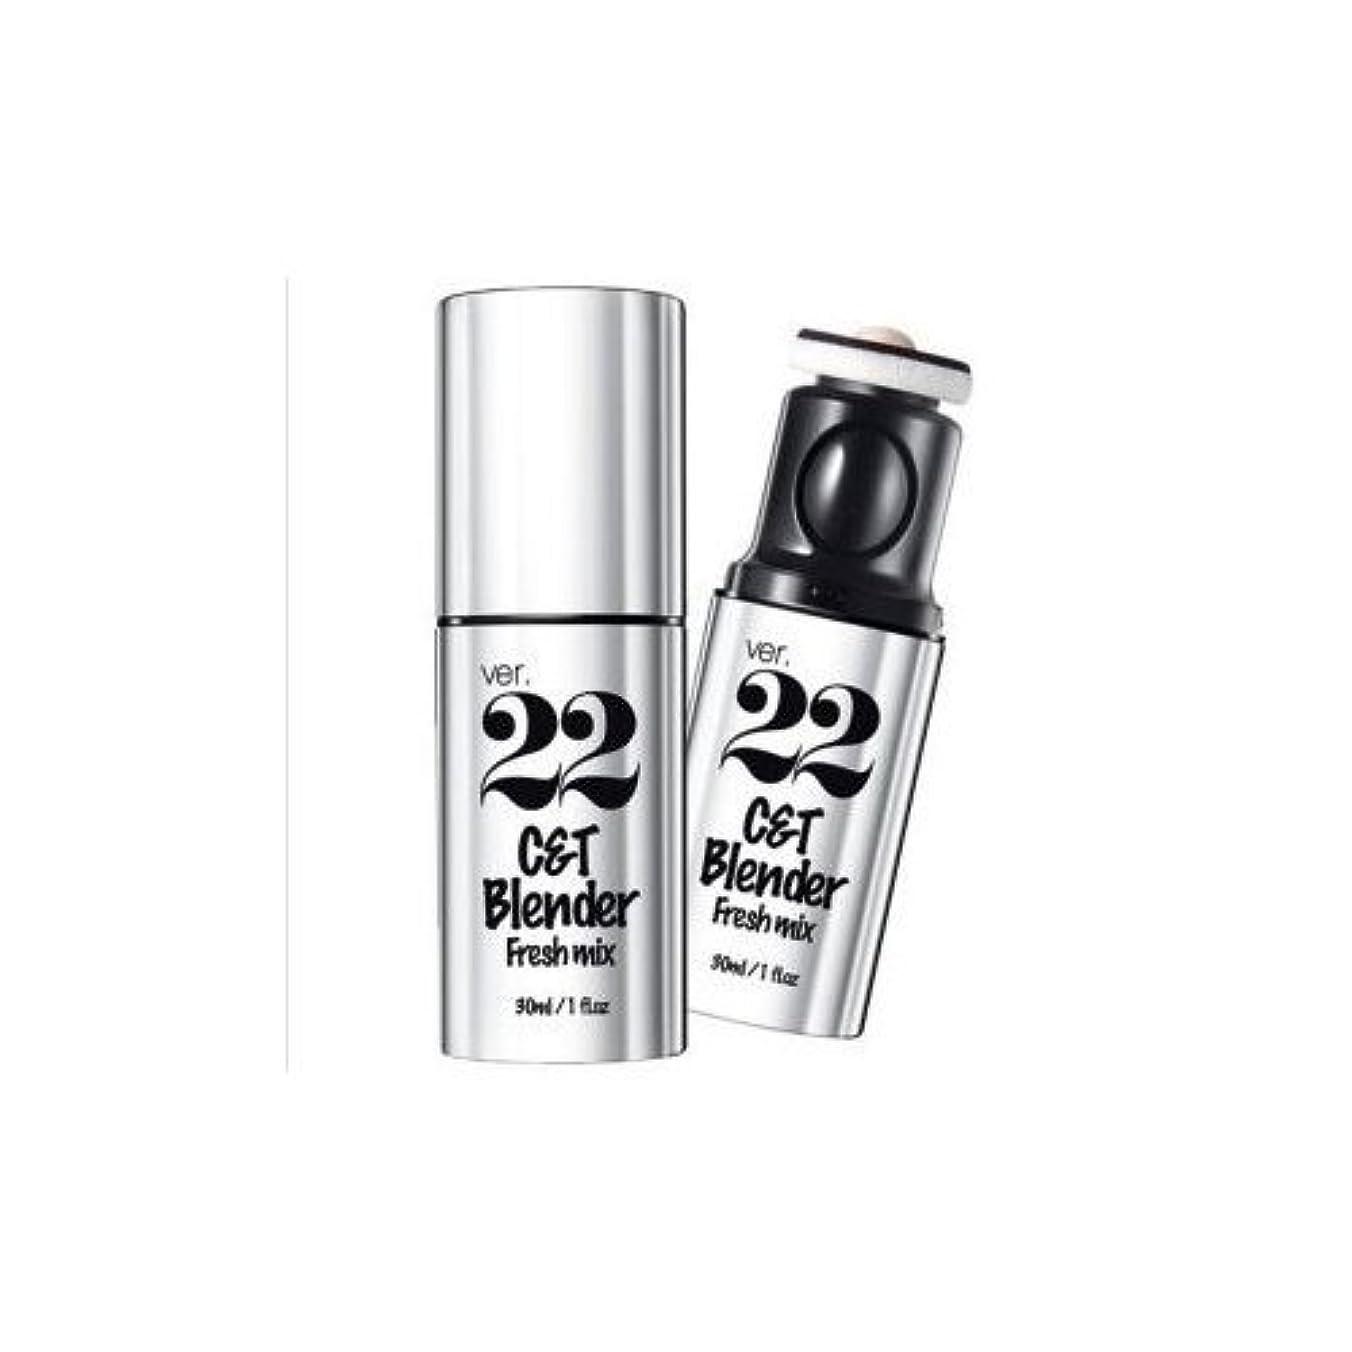 chosungah22 C&T Blender Fresh Mix 30ml, Capsule Foundation, #01, Korean Cosmetics